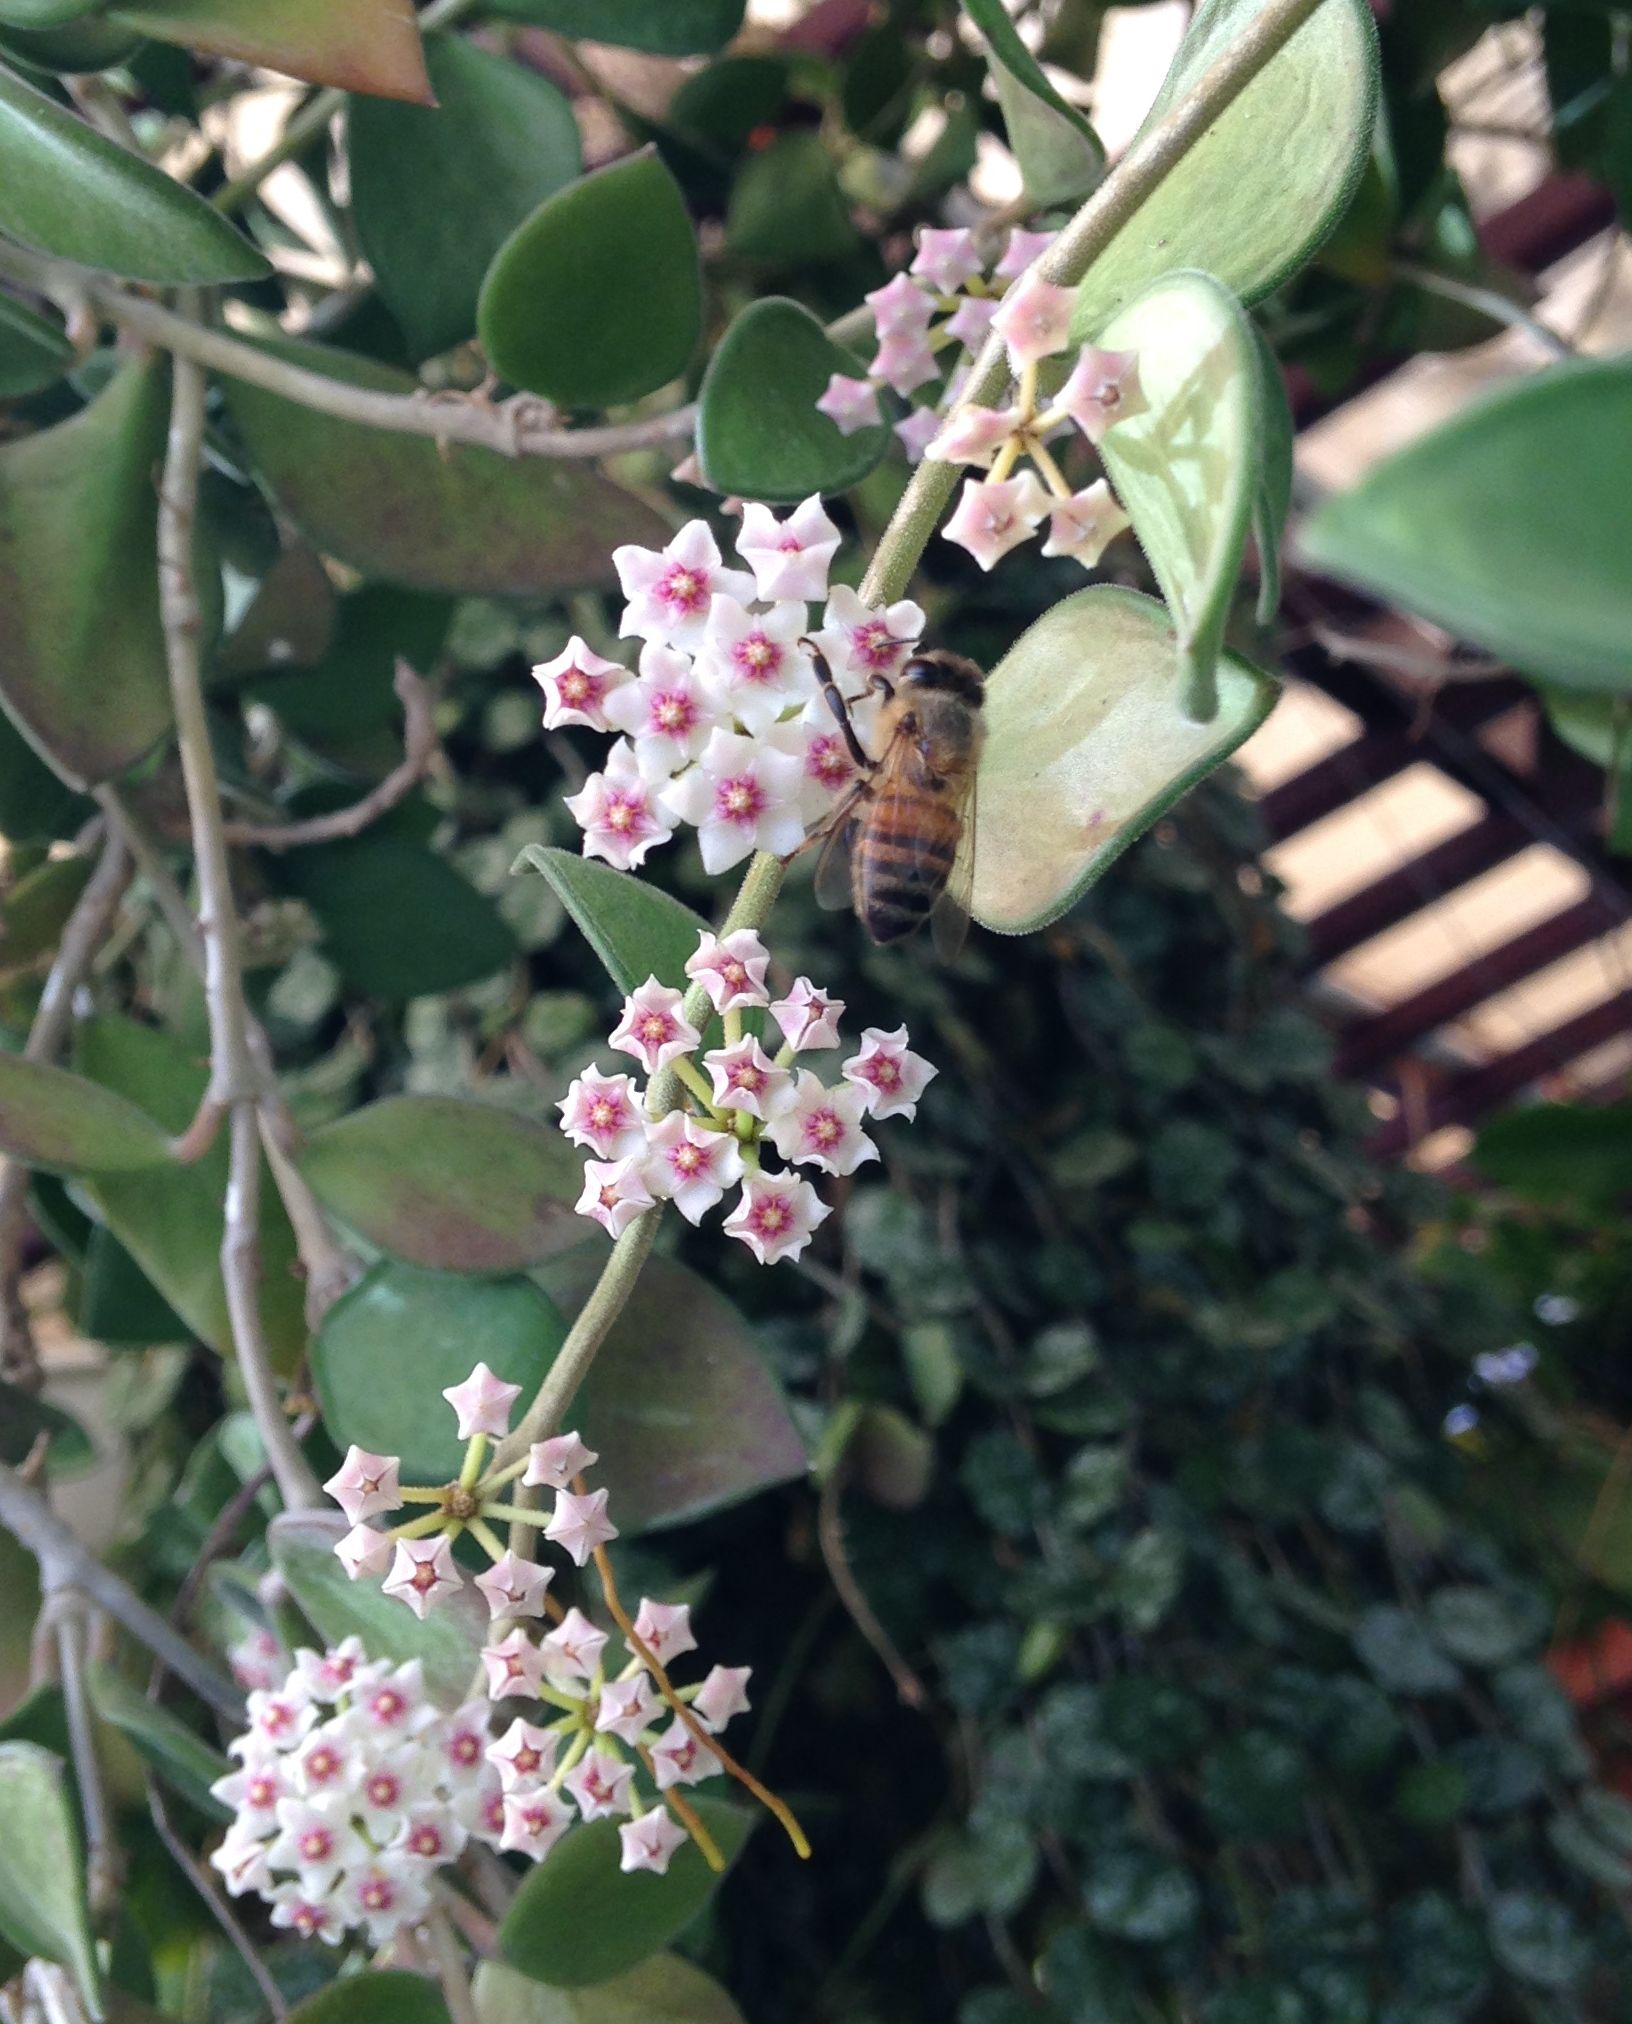 Hoya Nummulaiodes Hoya Lover Jan In Swflphotos Of Hoya Flowers